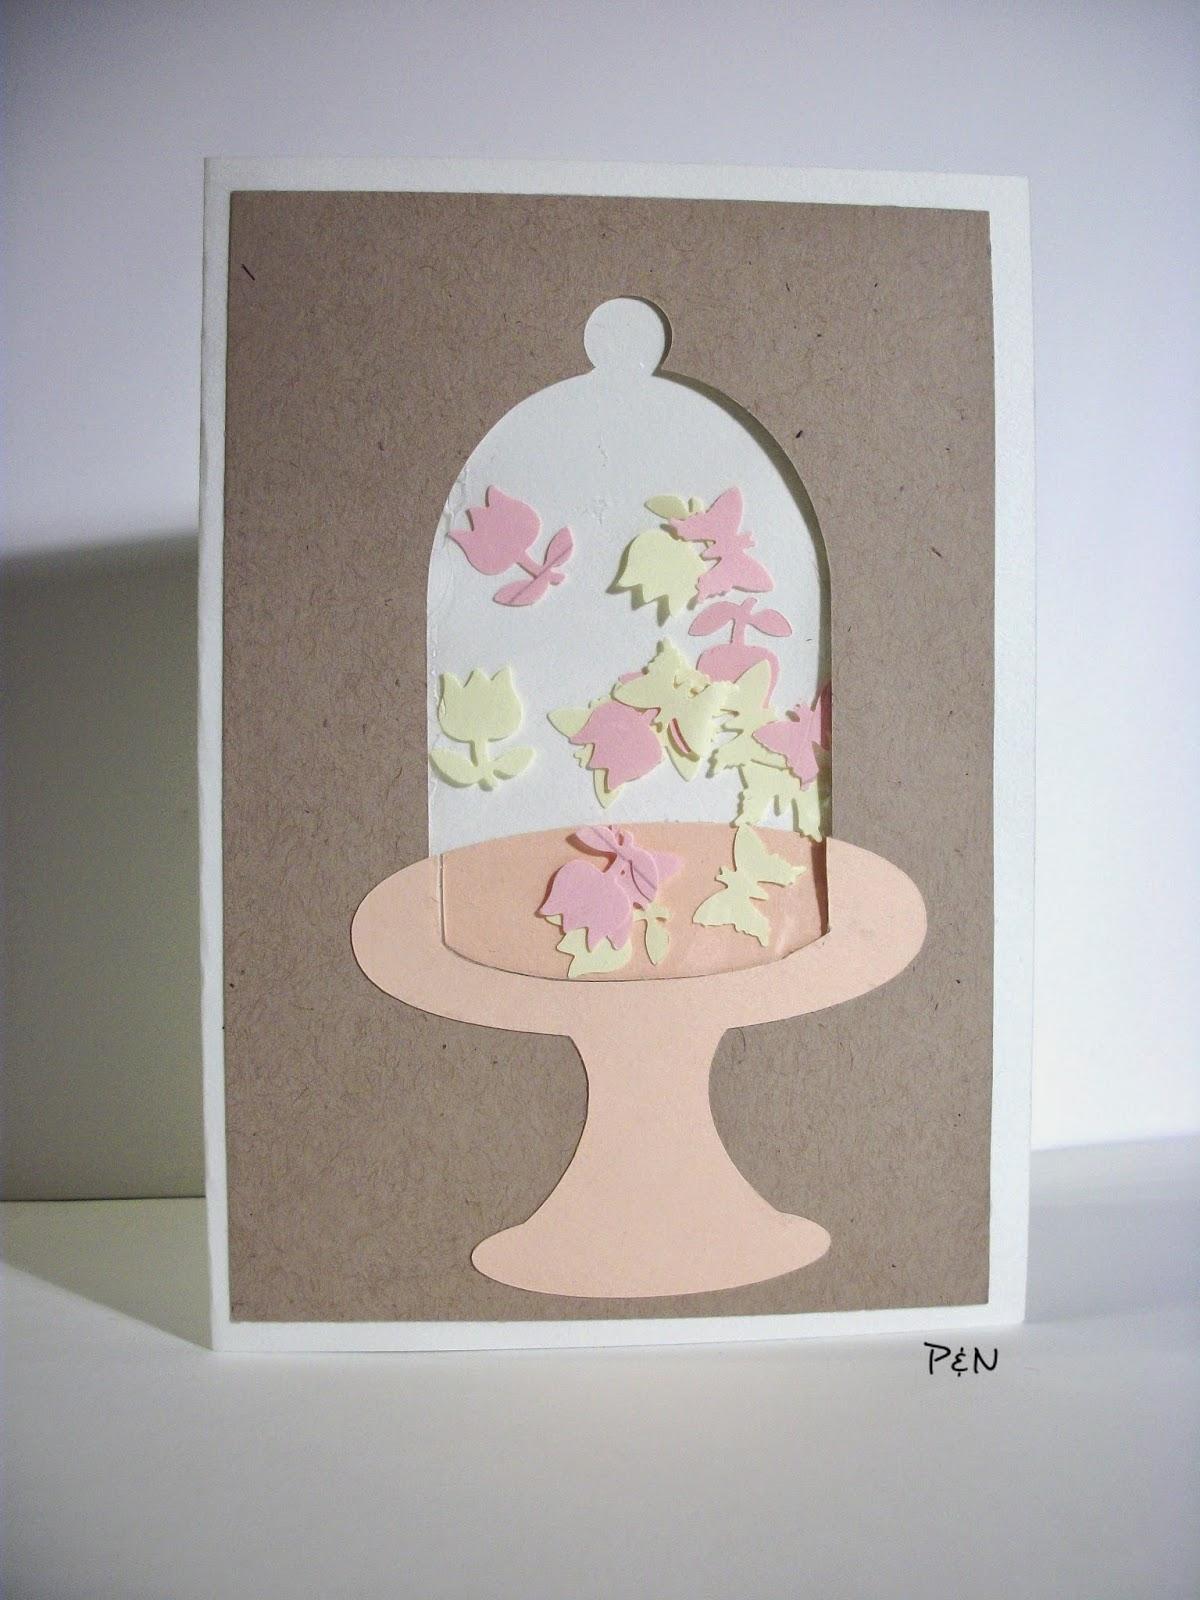 Pumps & Needles Bell Jar Shaker Card